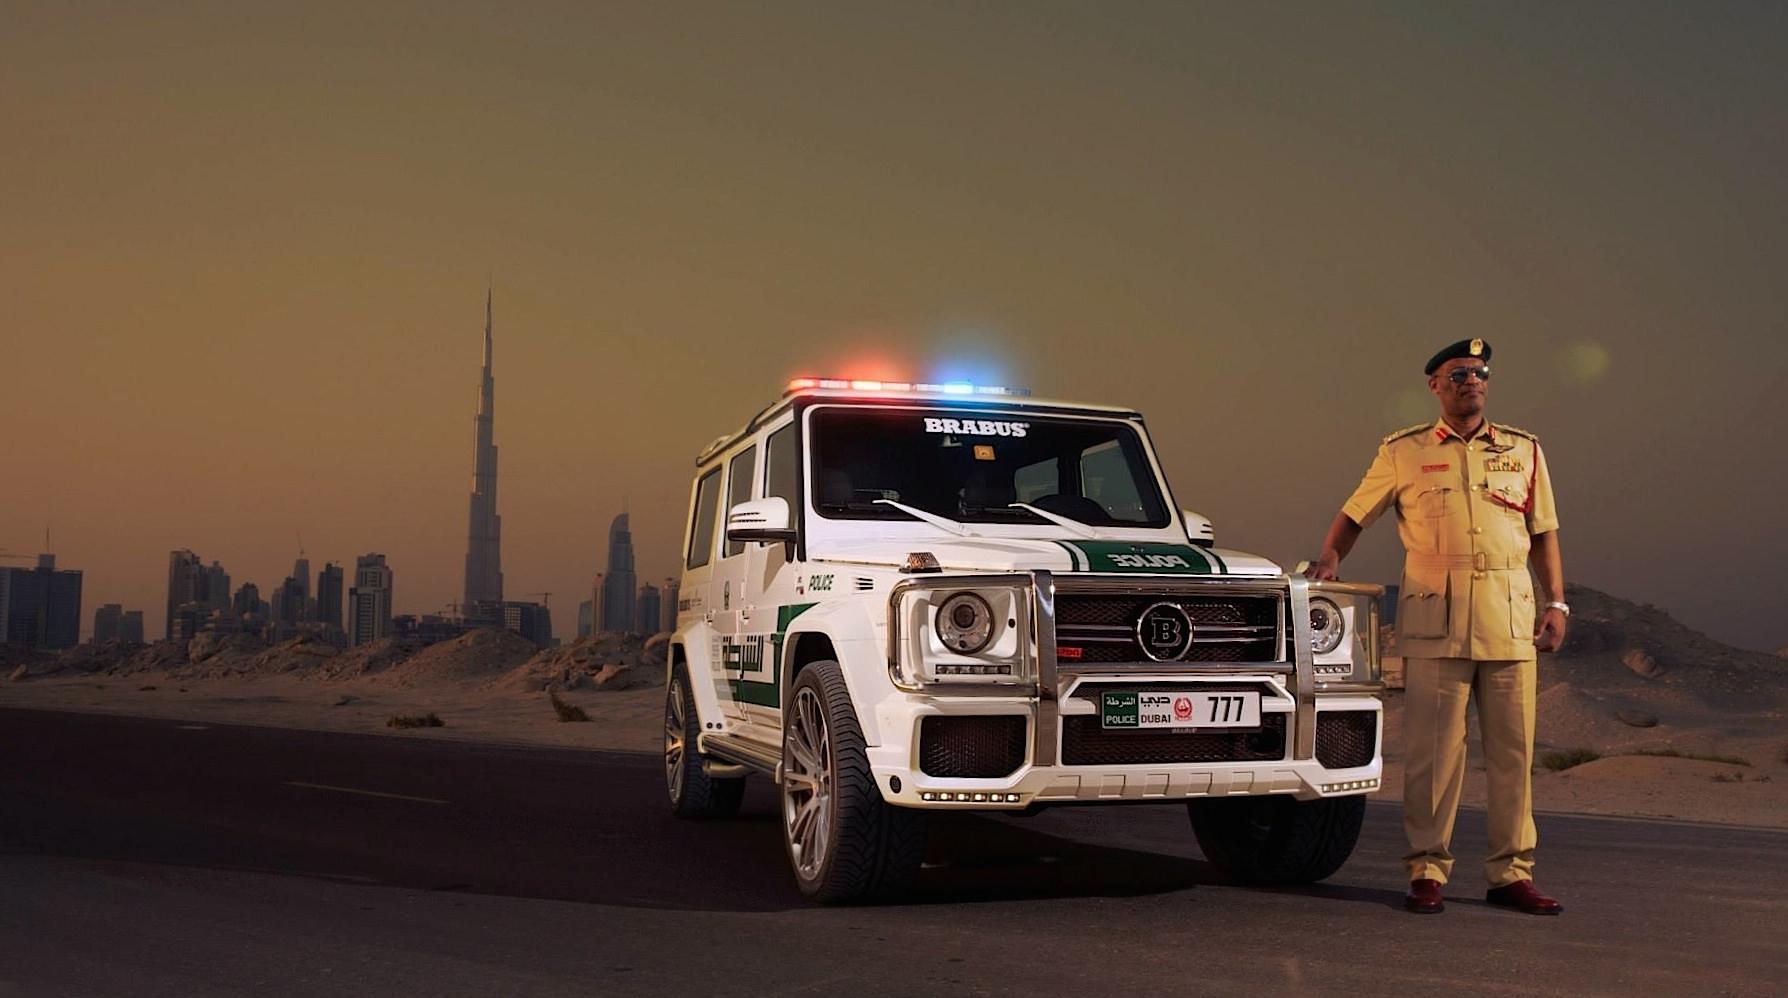 Island Detail And Color | Dubai Police 15